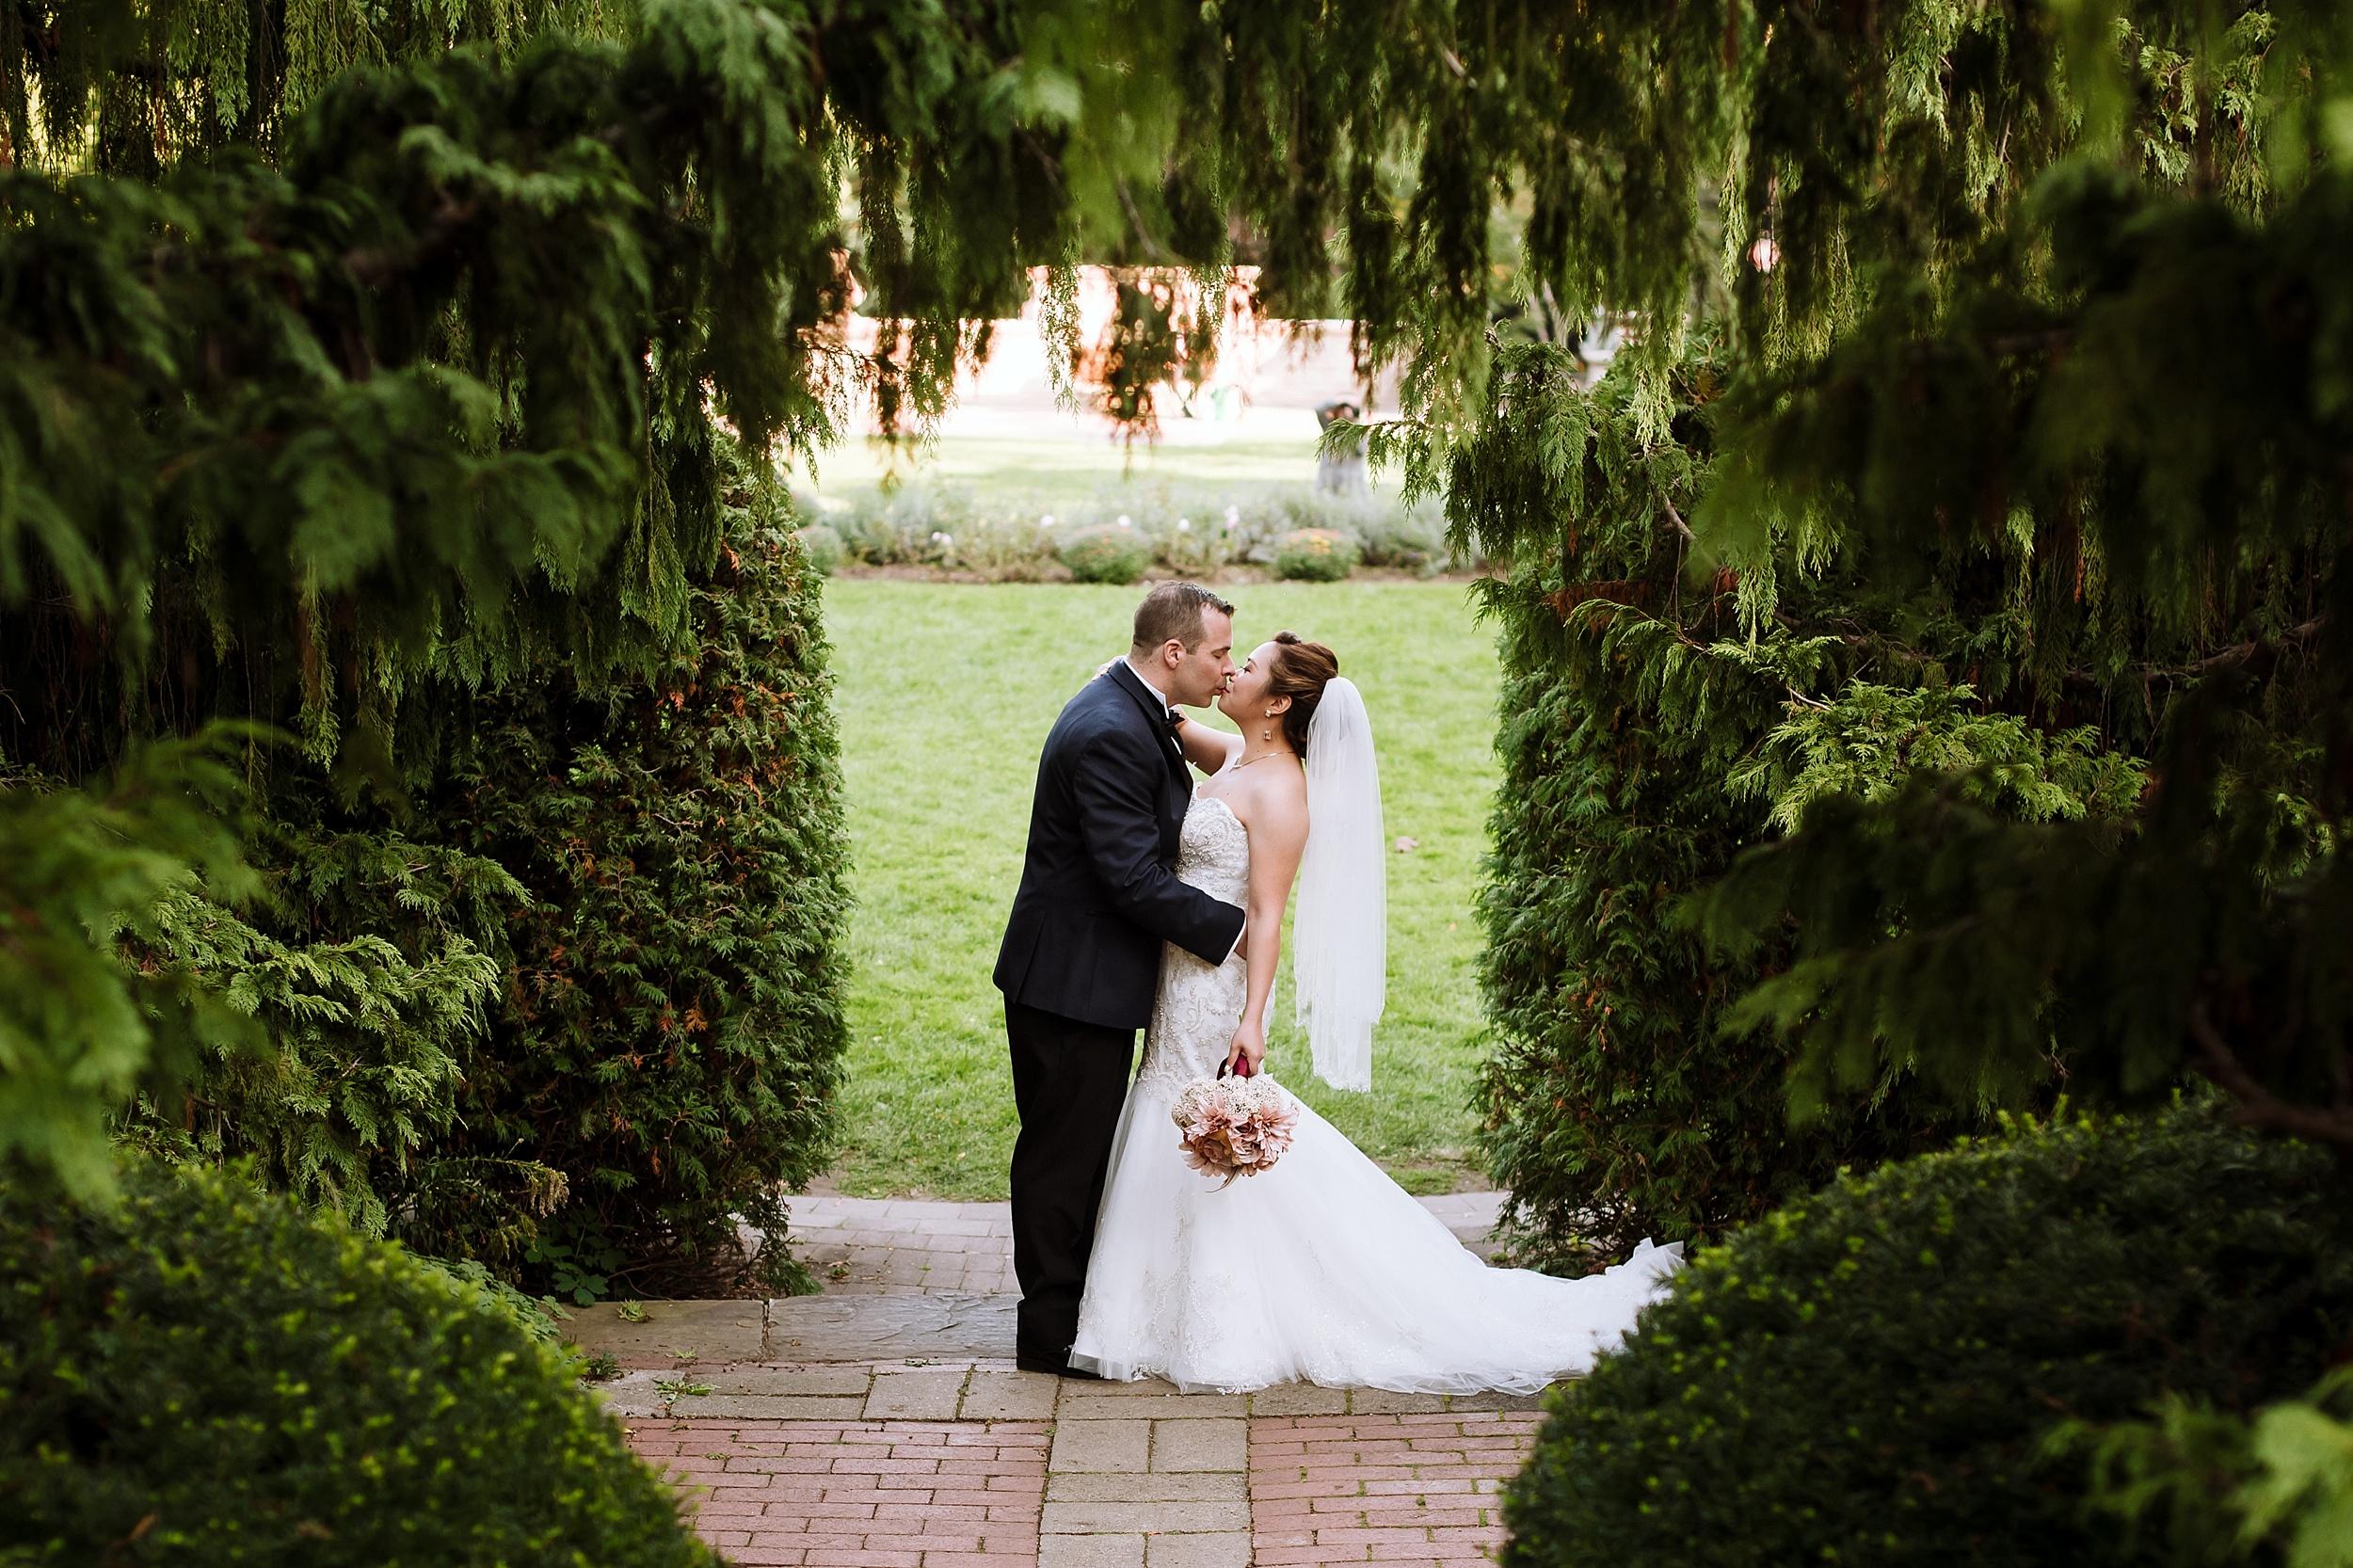 Sunnybrook_Estates_Alexander_Muir_Toronto_Wedding_Photographer_0015.jpg